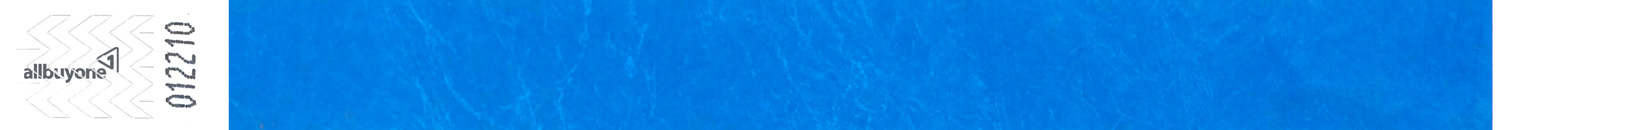 https://www.allbuyone.com/media/image/e9/8c/cd/tyvek-blau-1625x130.jpg